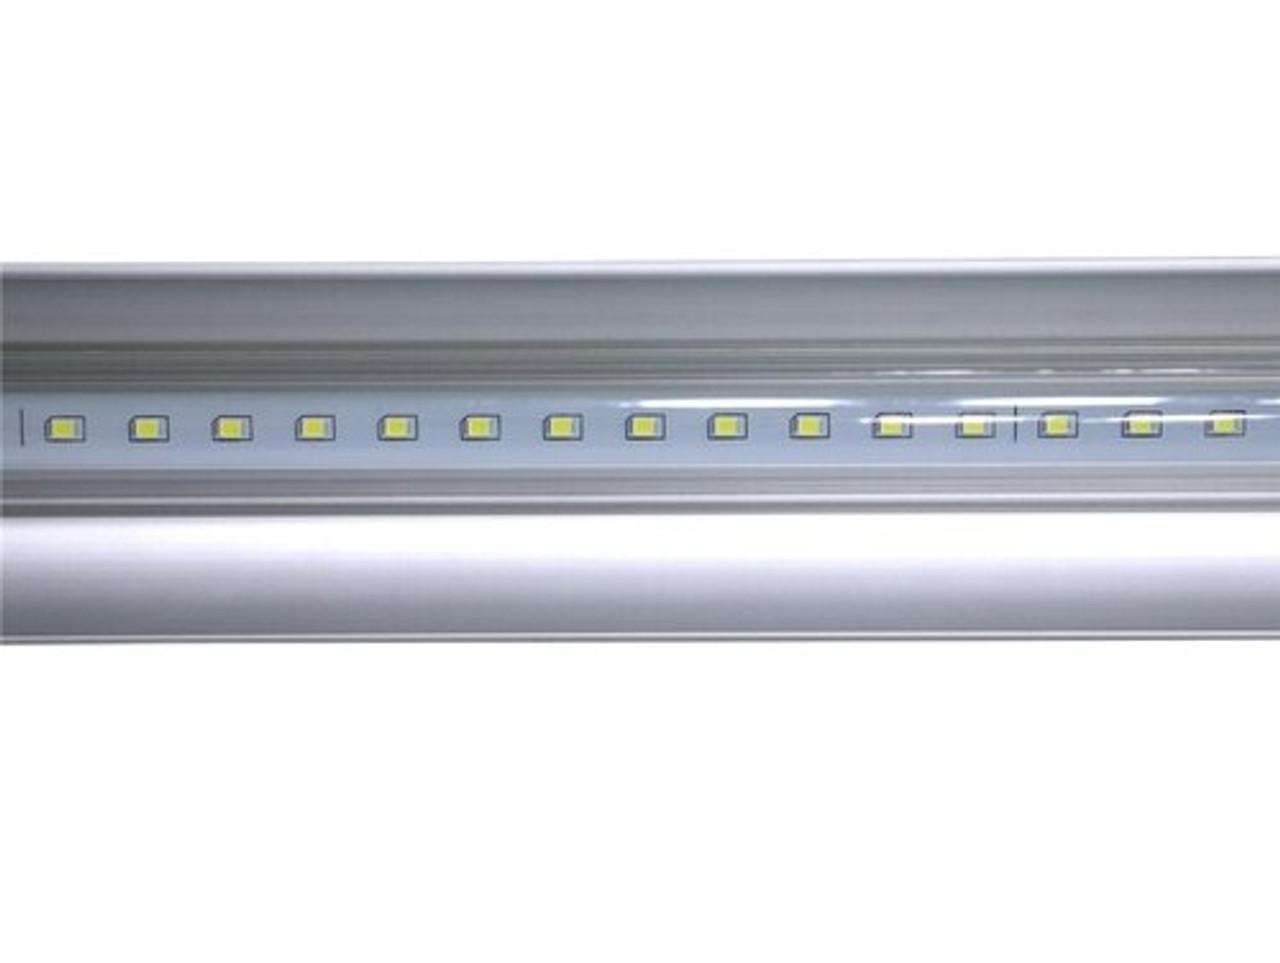 FloraGear Flora LS48 LED Light Strip 6400k 48w - chip view